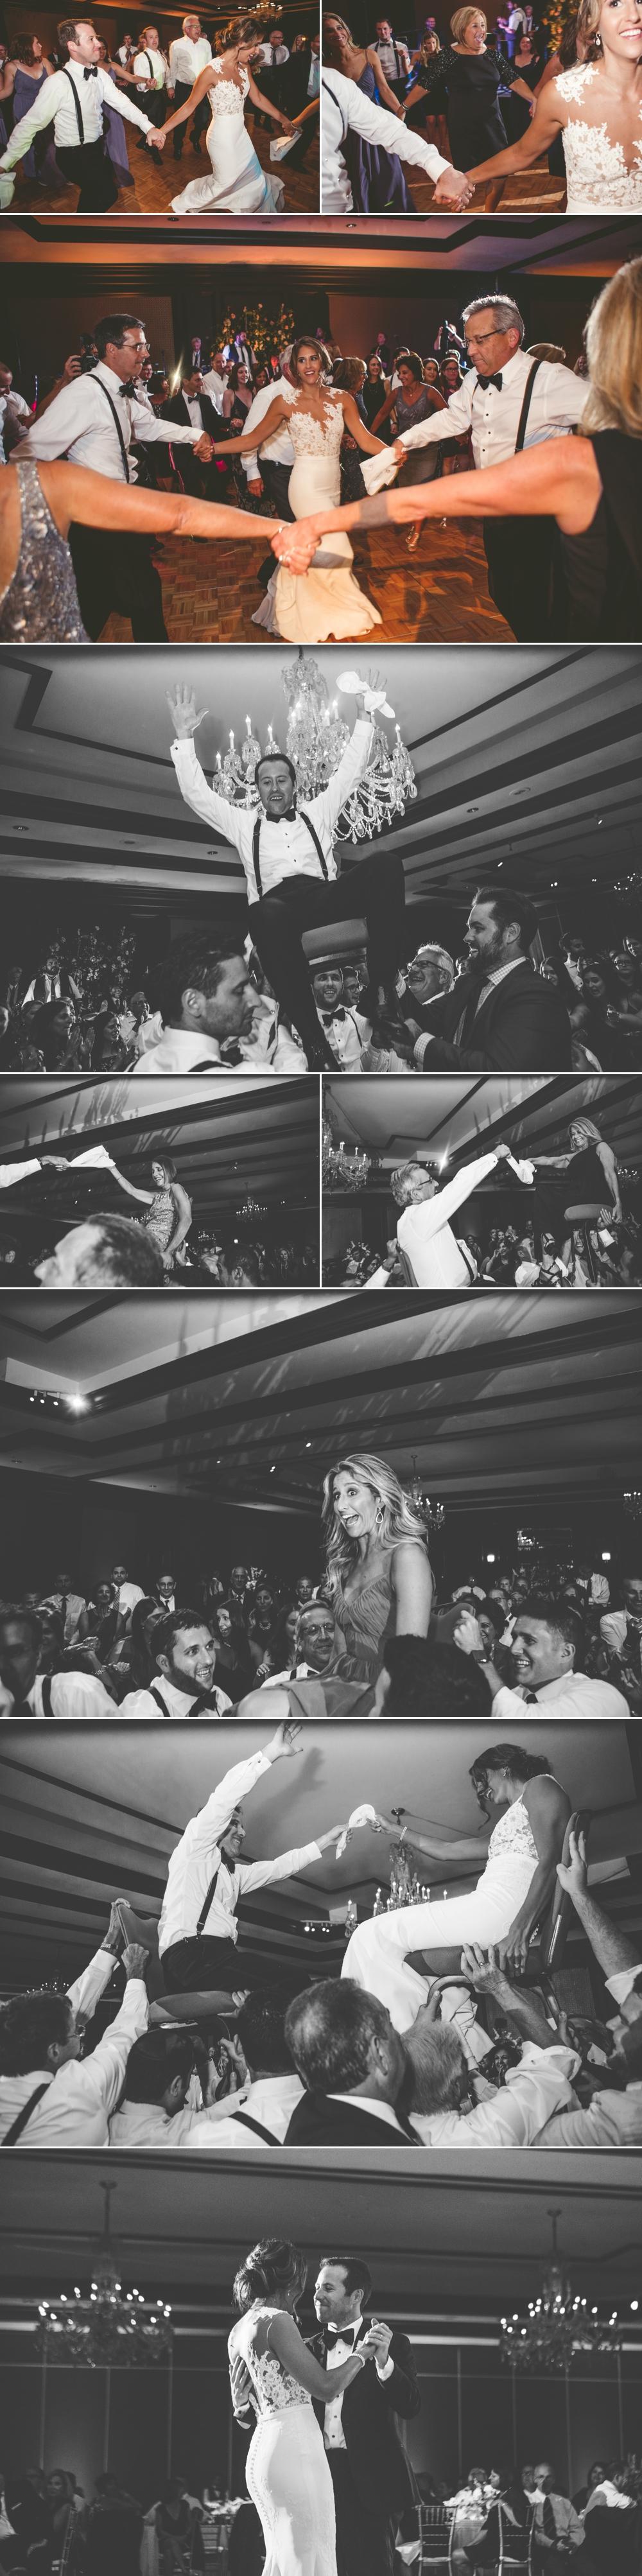 jason_domingues_photography_best_kansas_city_wedding_photographer_jewish_intercontinental_hotel_0006.JPG